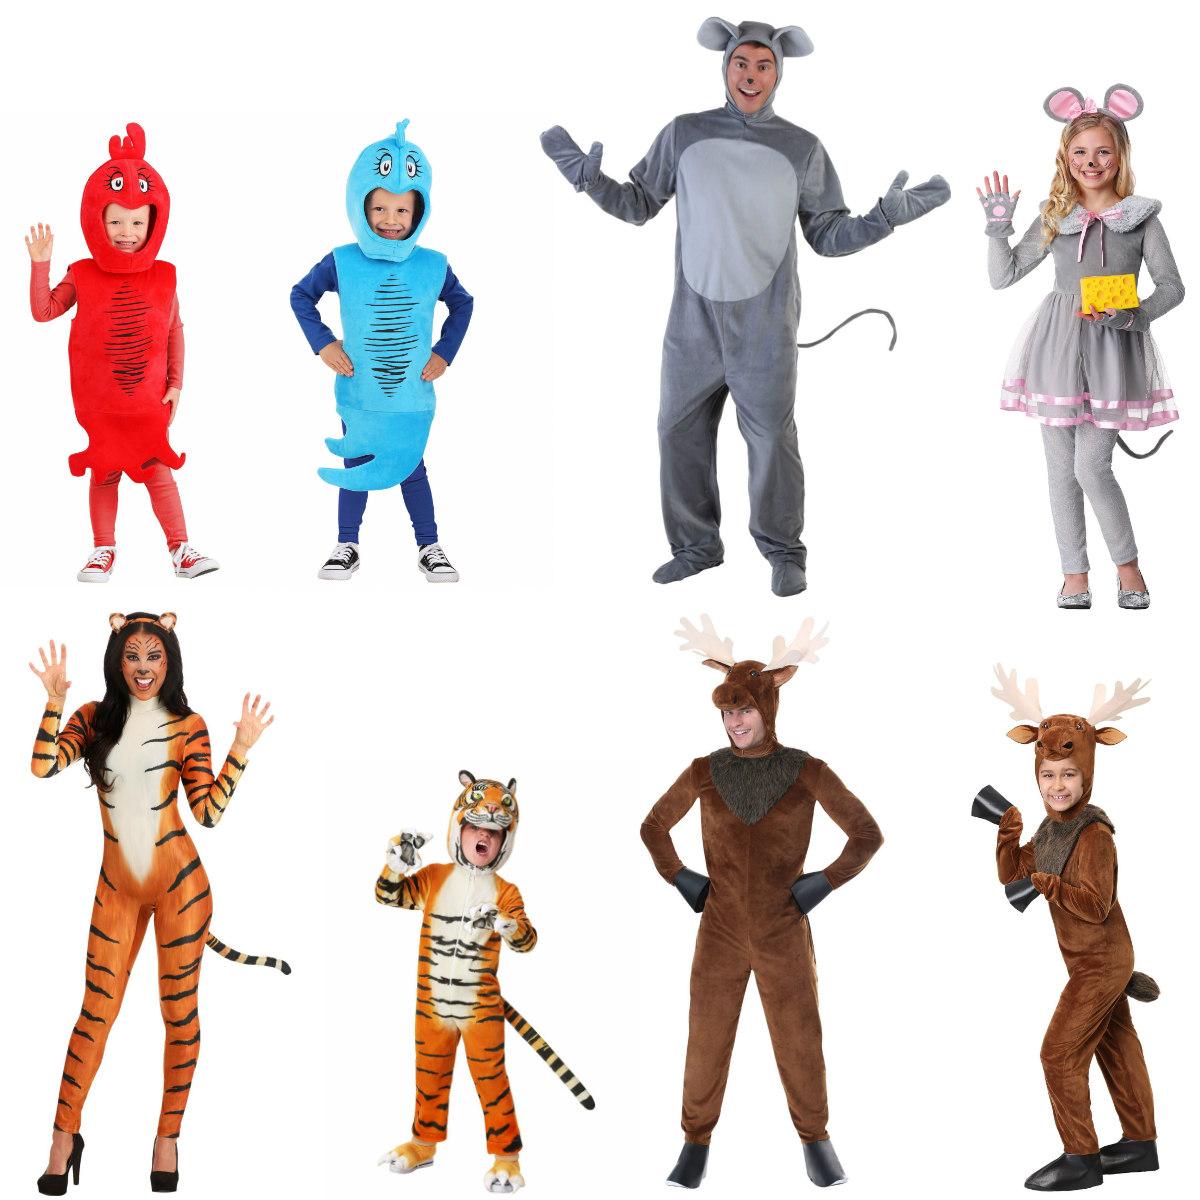 More Dr. Seuss Costumes